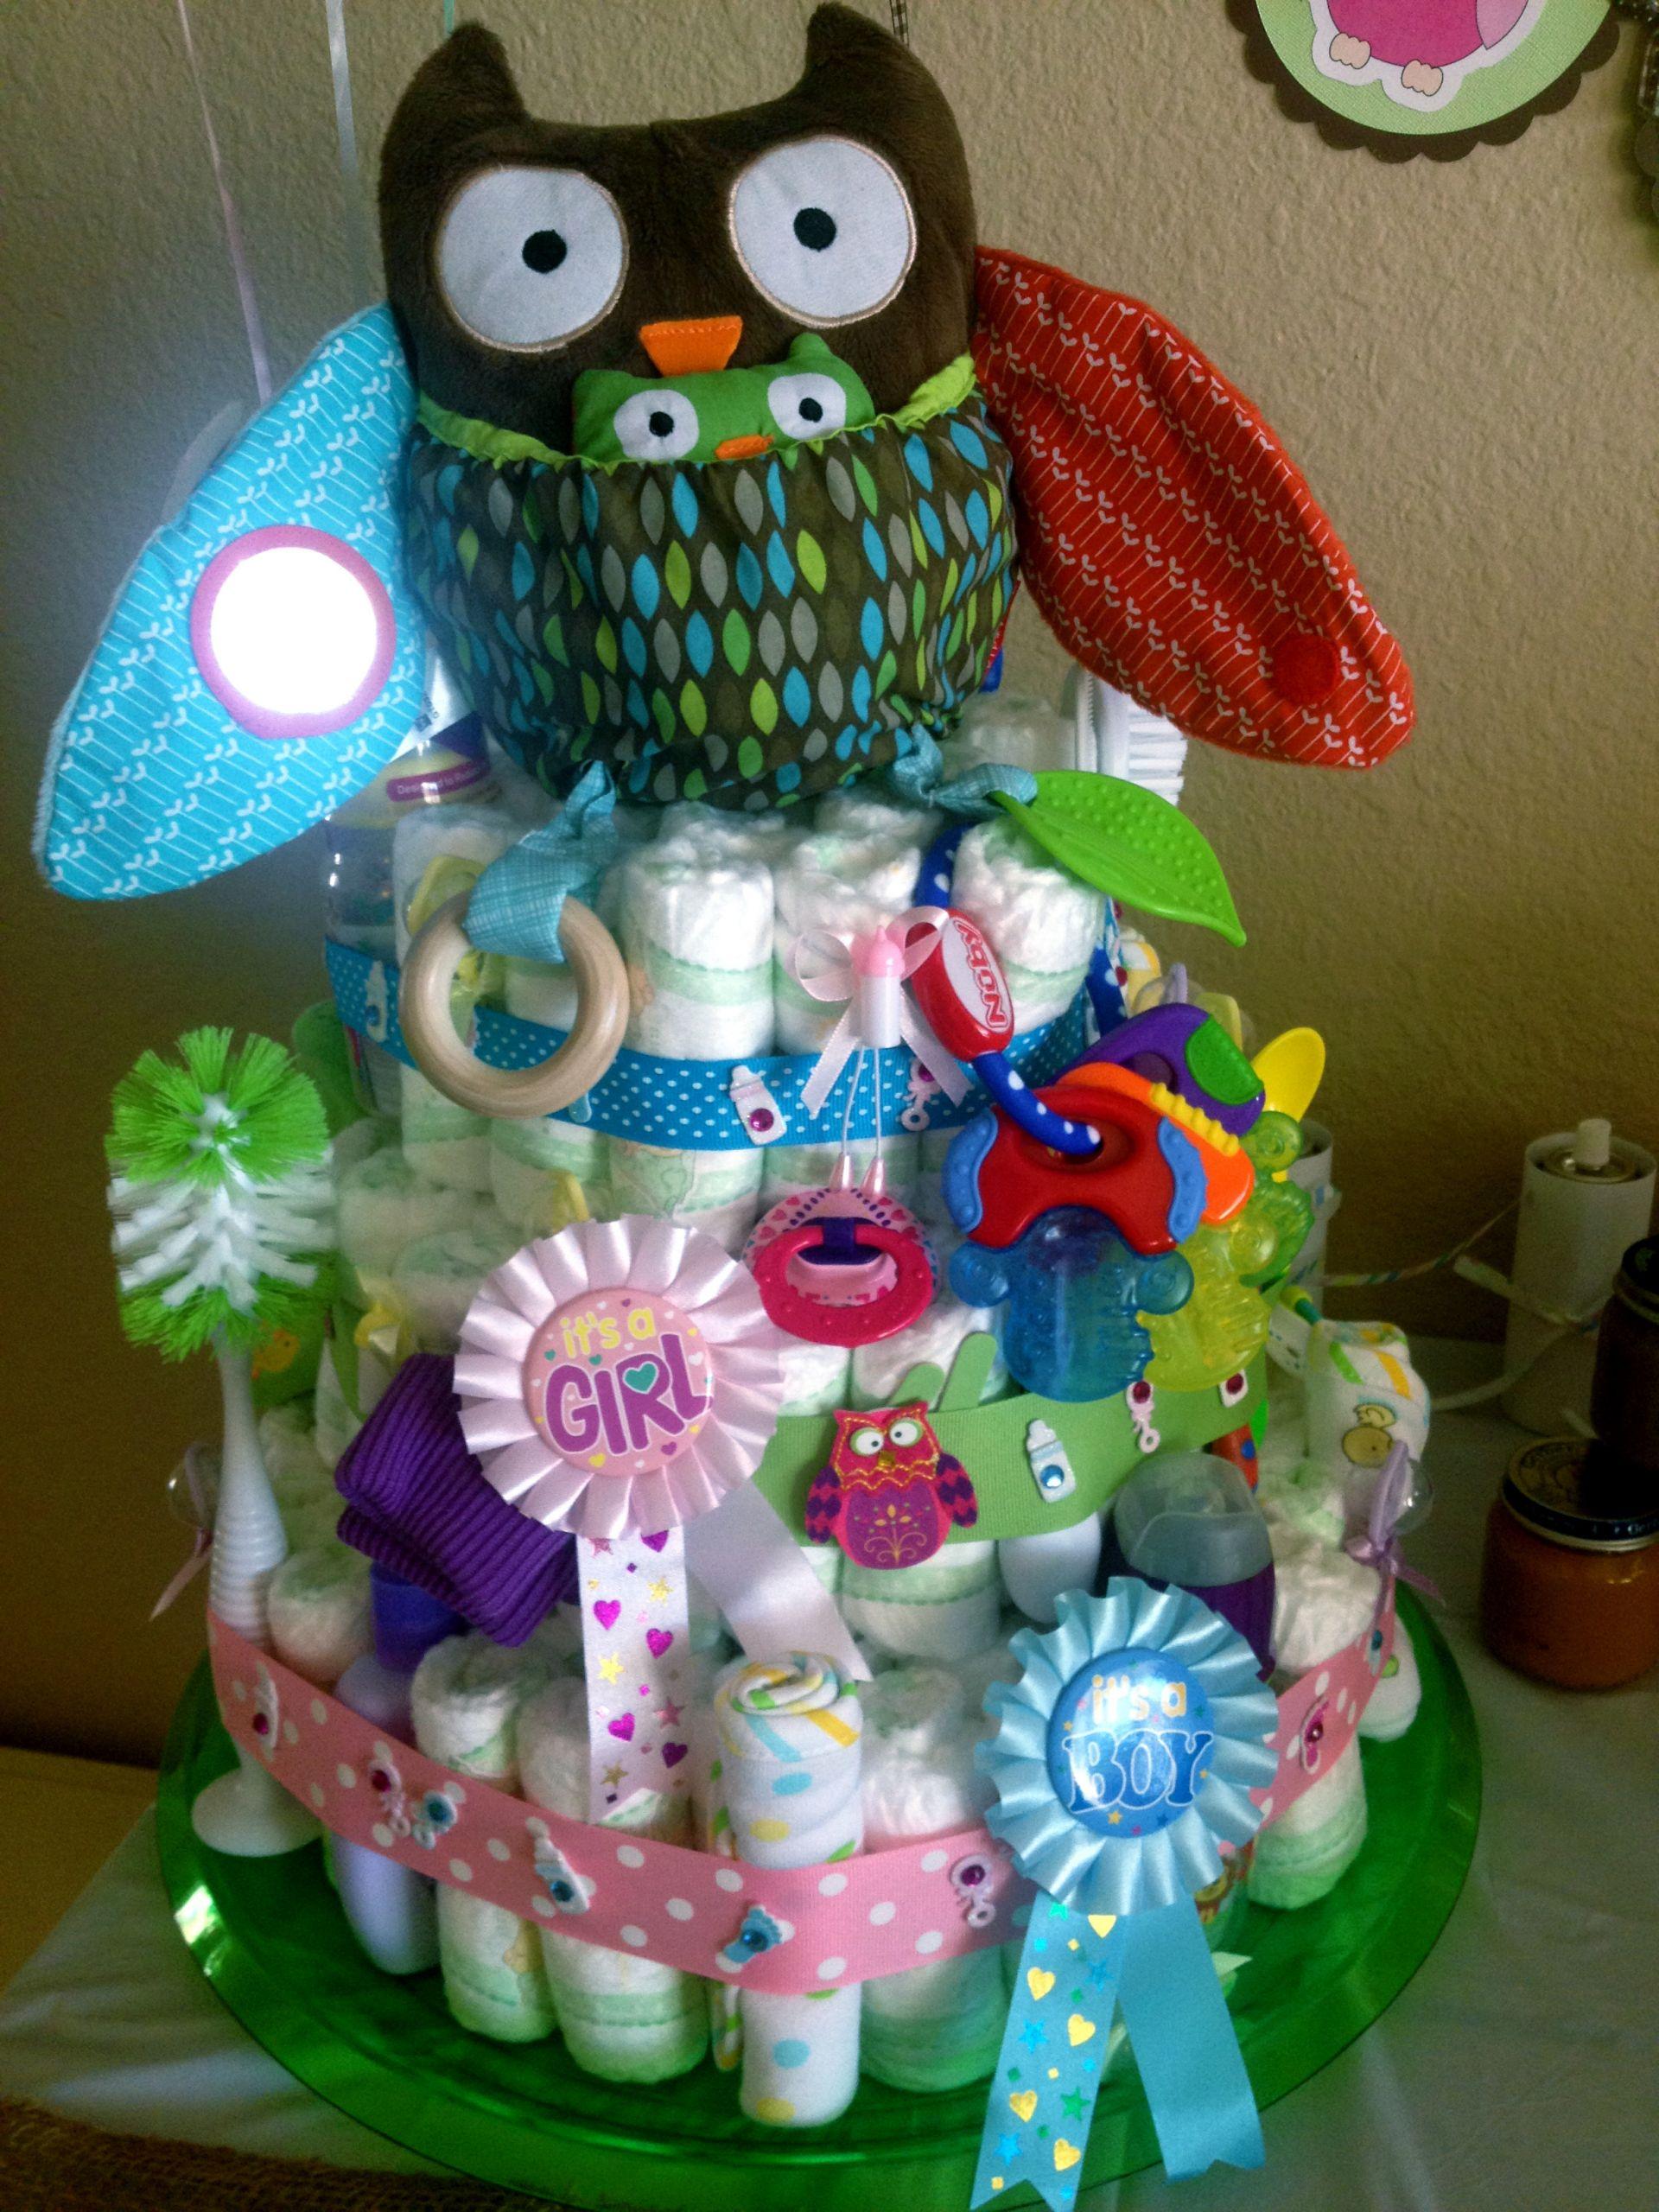 Baby Gender Reveal Gift Ideas  Gender Reveal Baby Shower